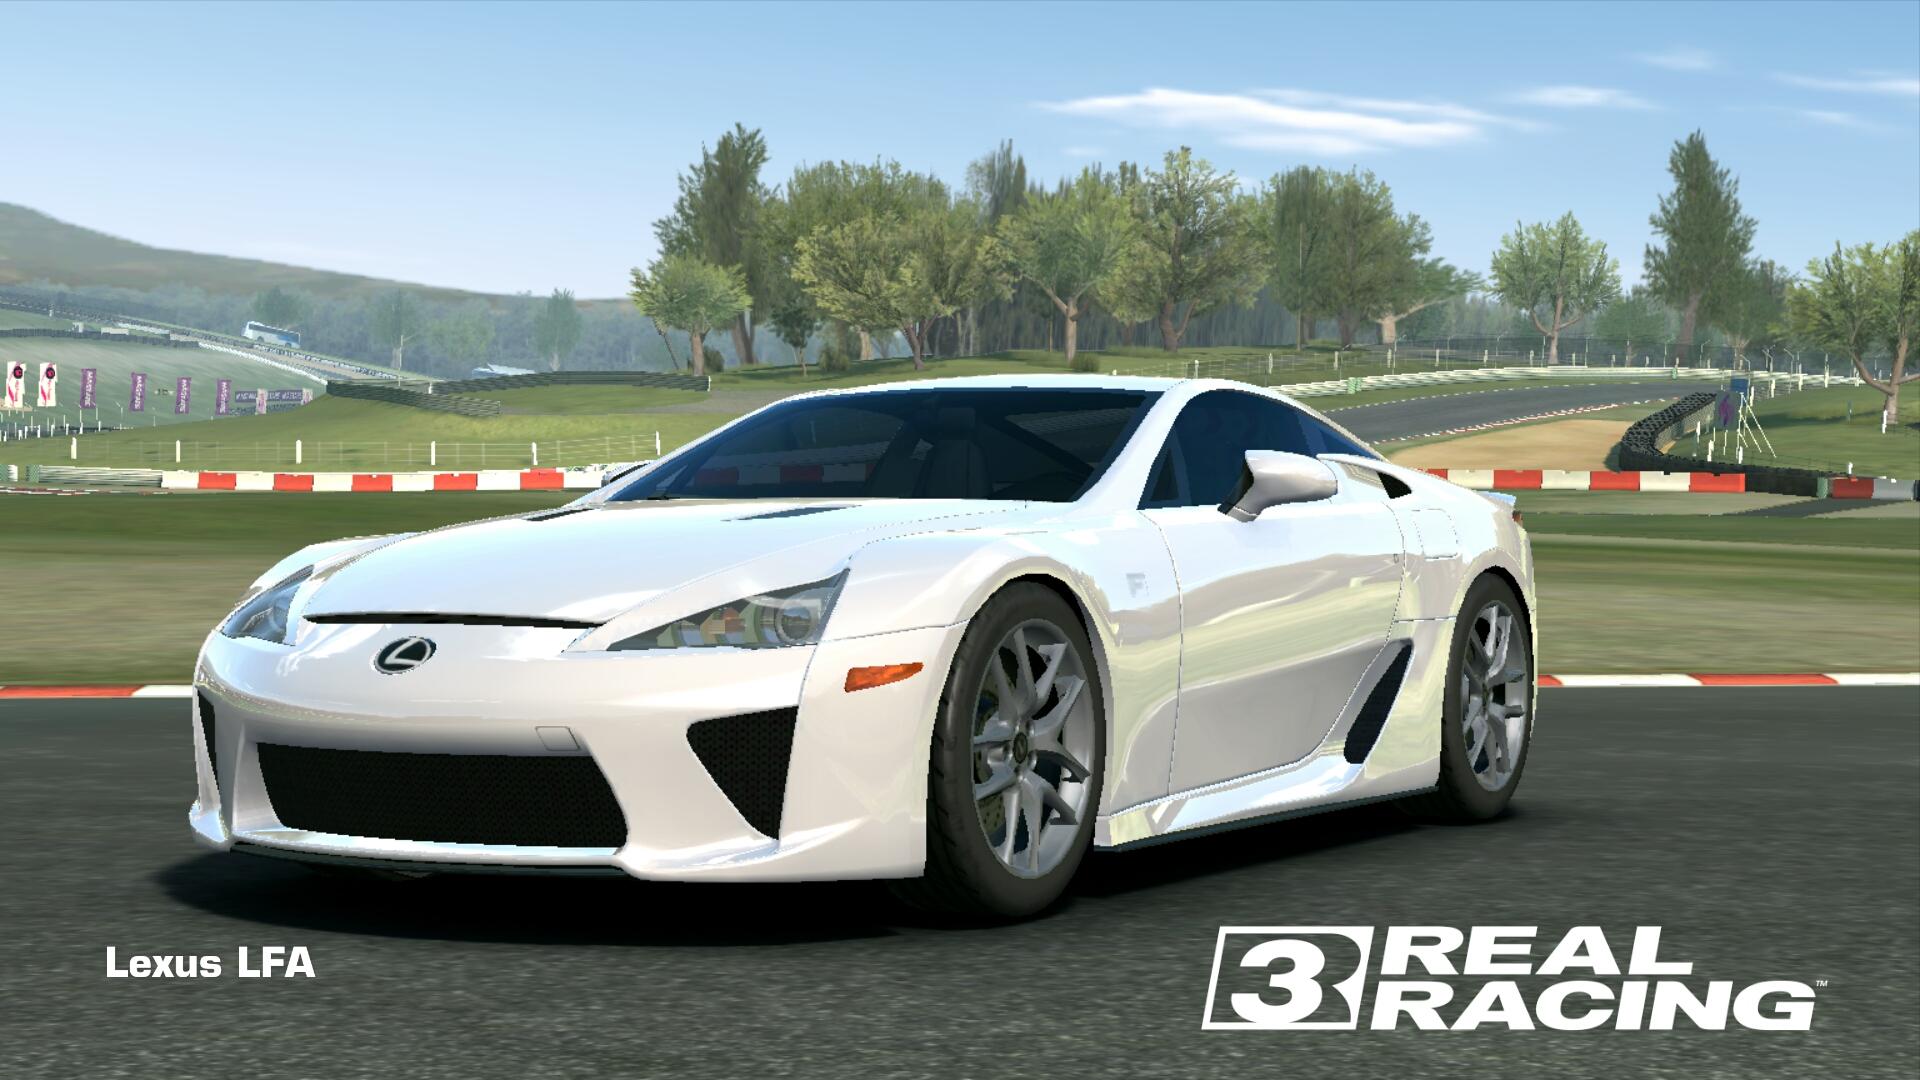 Image Showcase Lexus LFAjpg Real Racing Wiki FANDOM - Audi car wiki